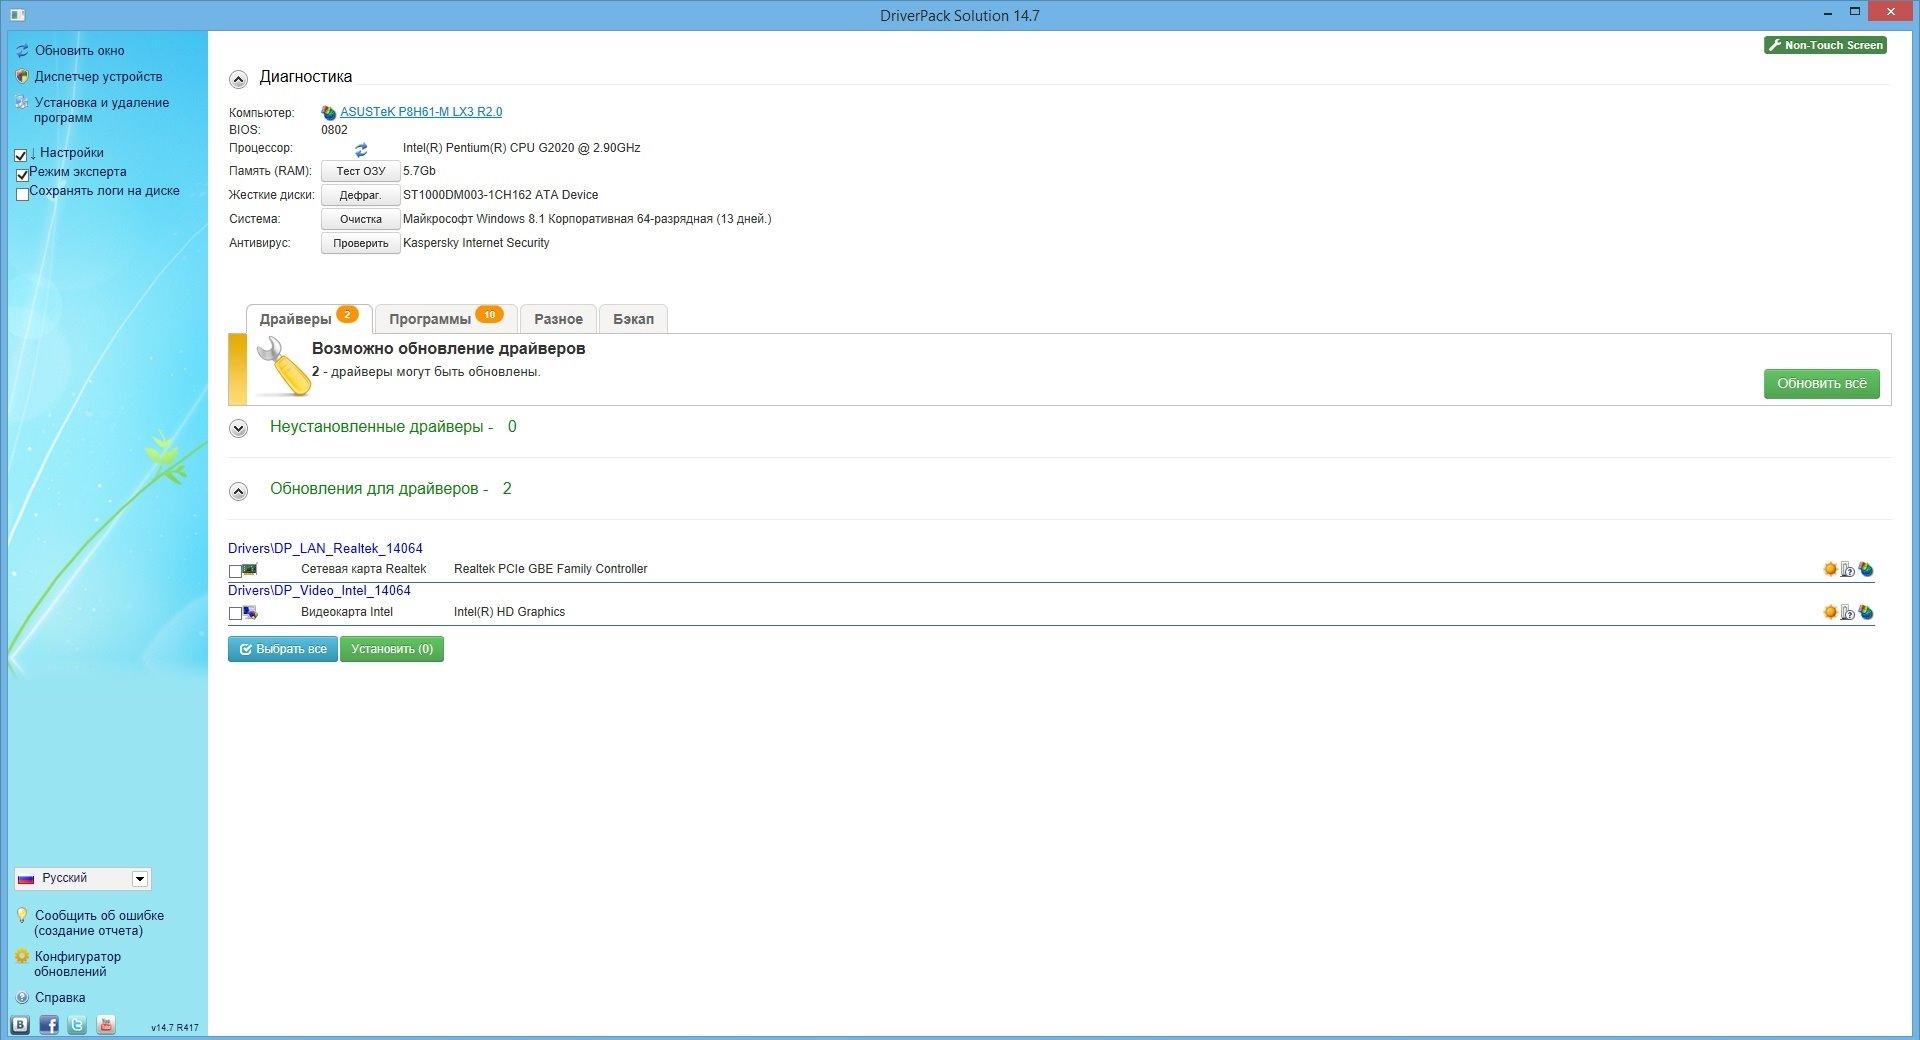 DriverPack Solution 14.7 R417 + Драйвер-Паки 14.06.6 (2014) Multi / Русский